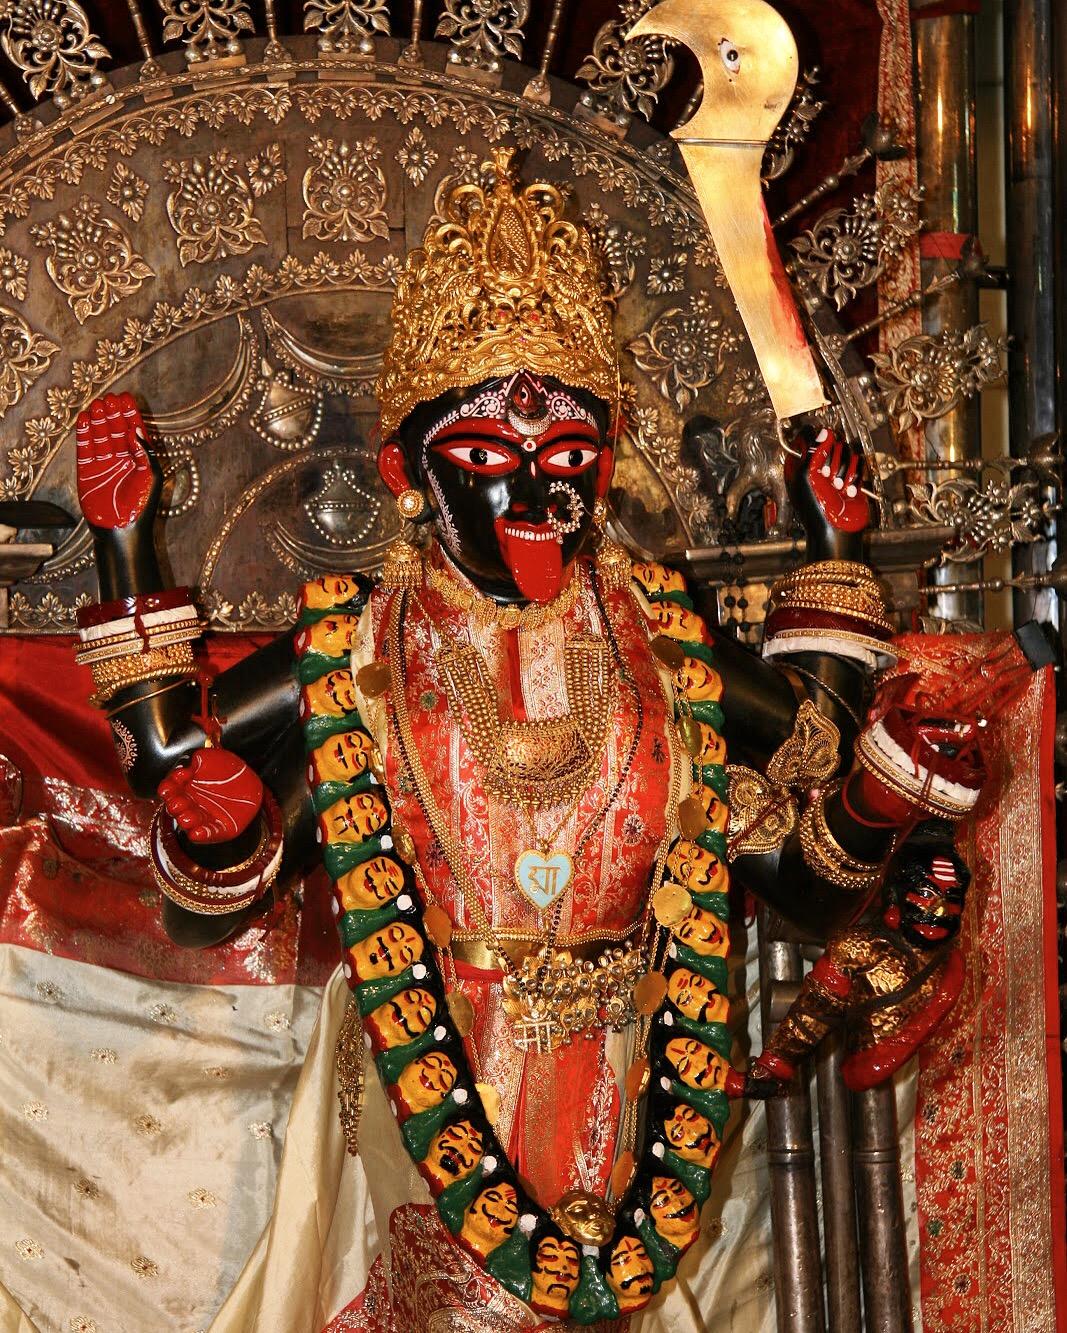 Ma Bhavatarini, Dakshineswar Kali Temple, by Usha Harding.